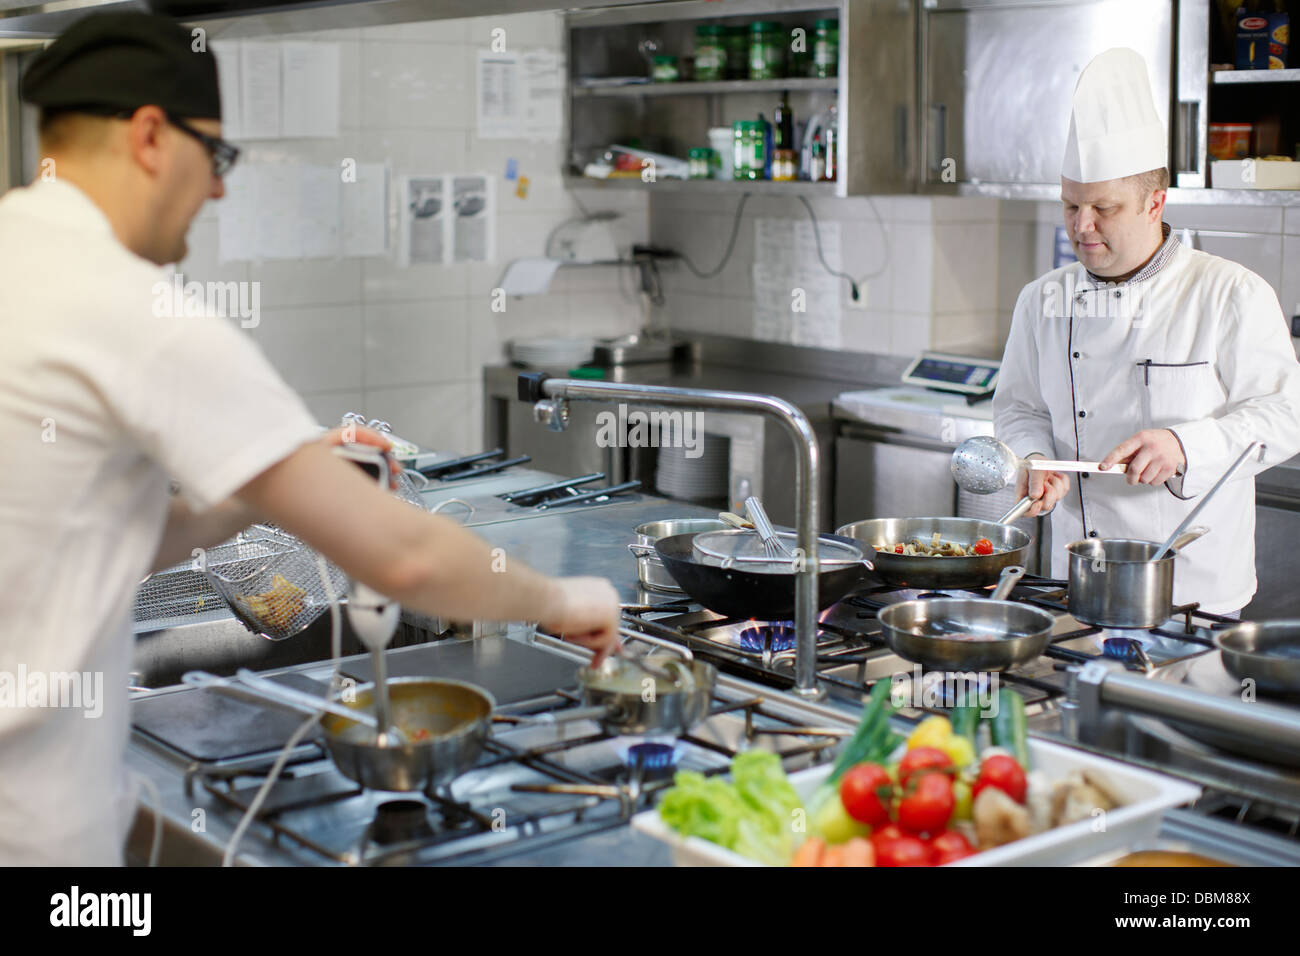 Dos personas en cocina comercial Imagen De Stock